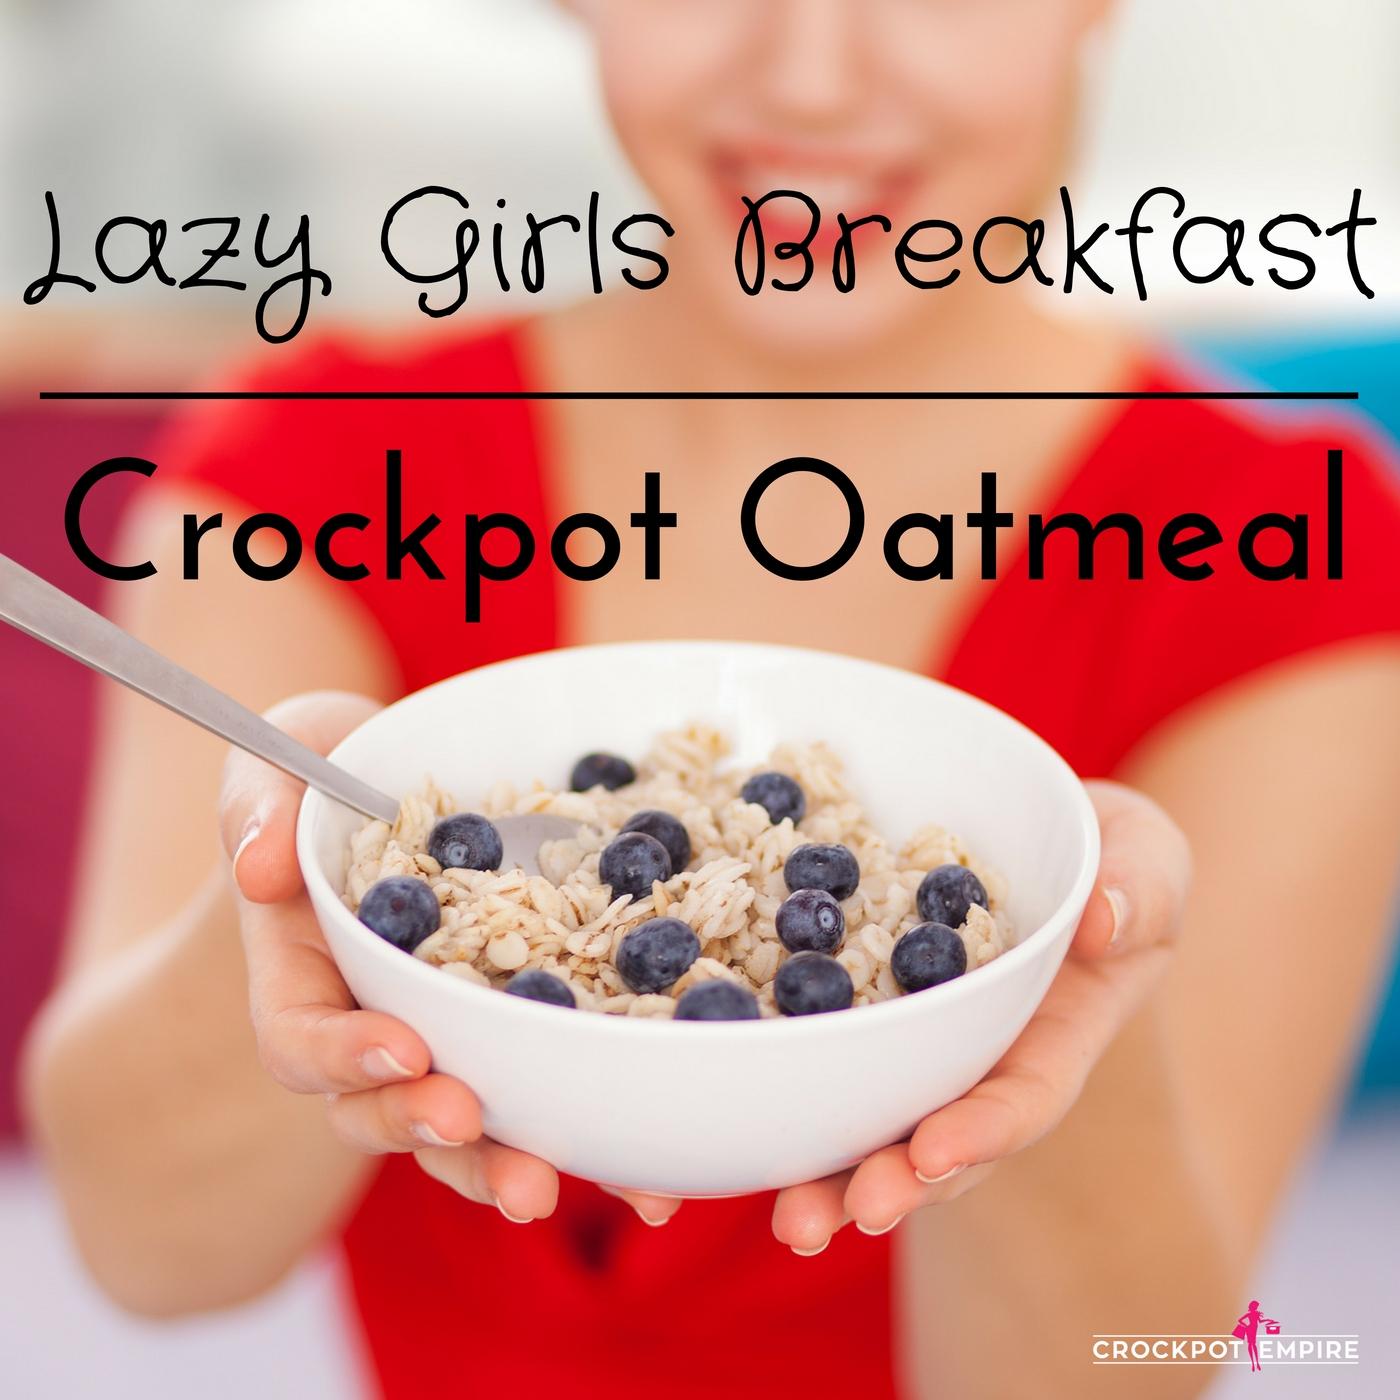 Crockpot Oatmeal using steel oats overnight - Crockpot Empire